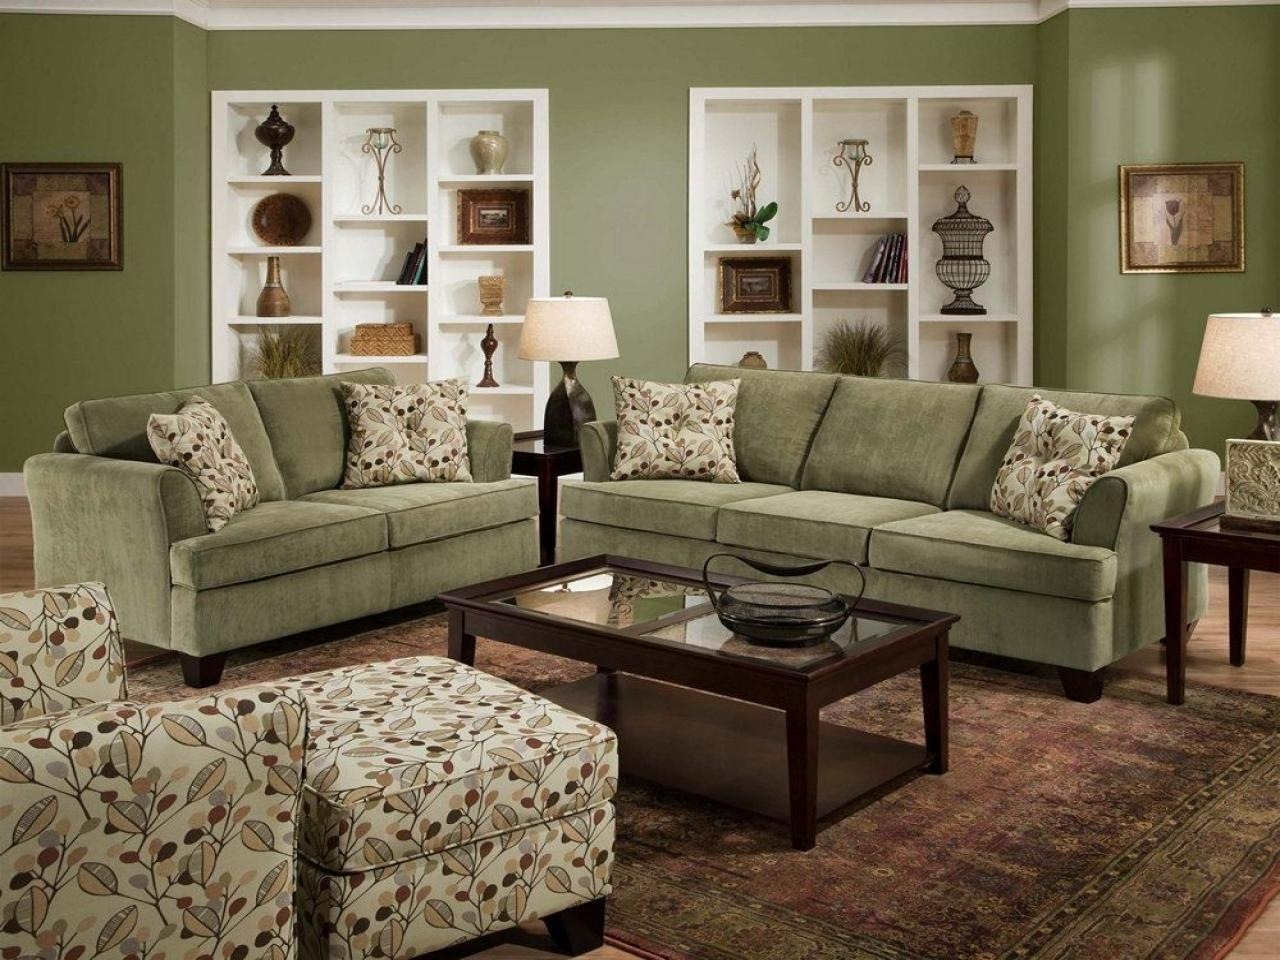 Green Microfiber Sofa With Design Picture 39085 | Kengire regarding Green Microfiber Sofas